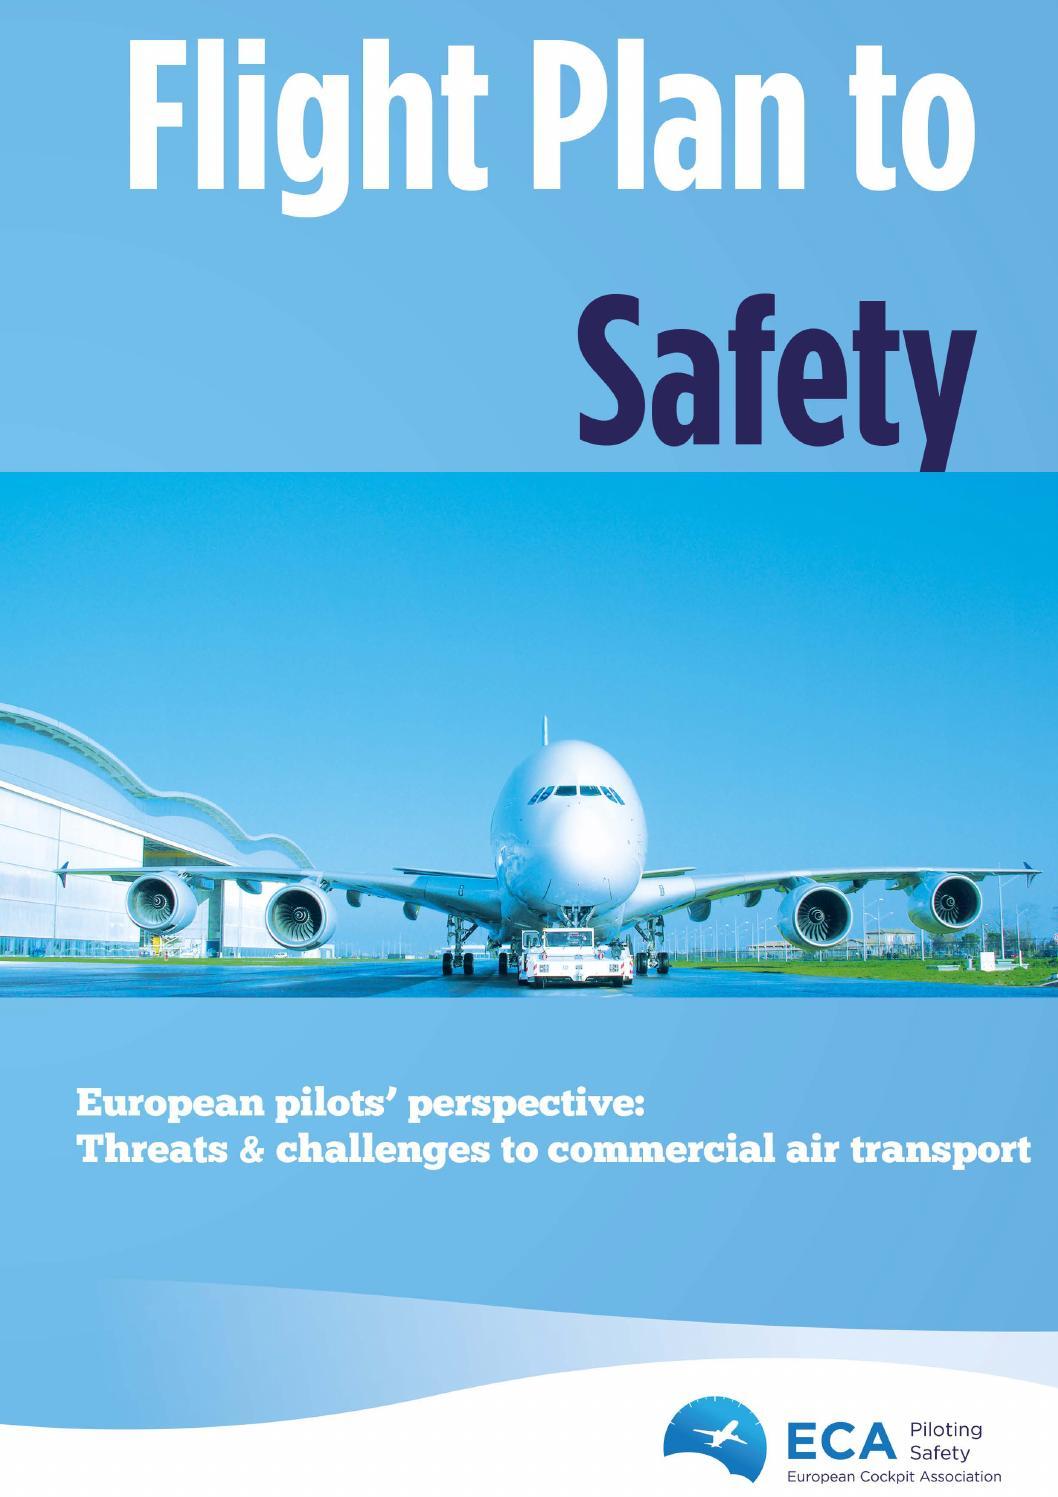 European Cockpit Association Eca: ECA Flight Plan To Safety By European Cockpit Association